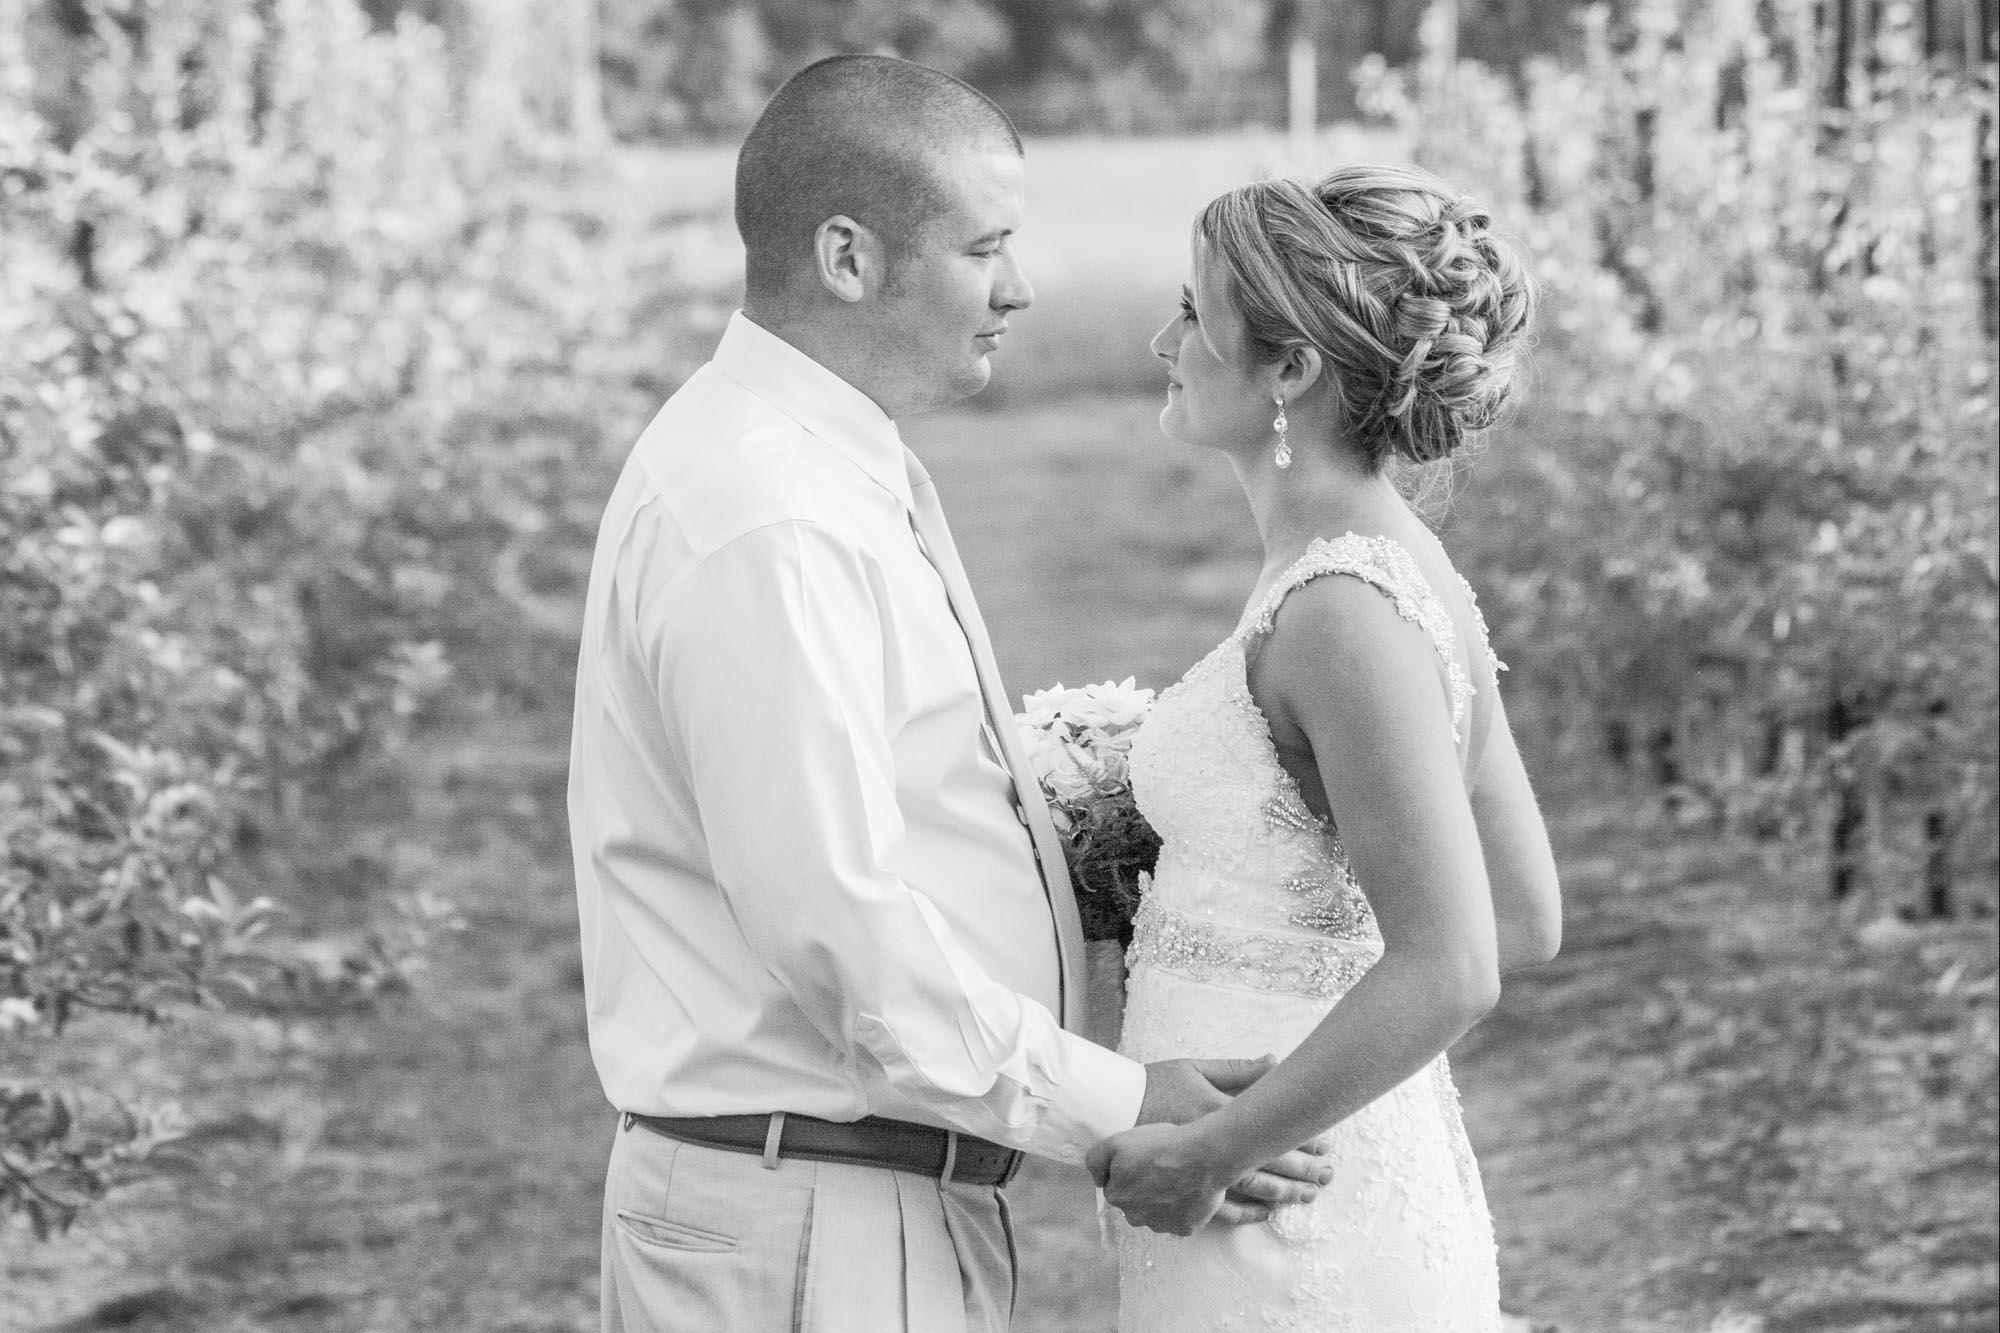 wv-wedding-photographer-sheena-pendley-7276-bw.jpg